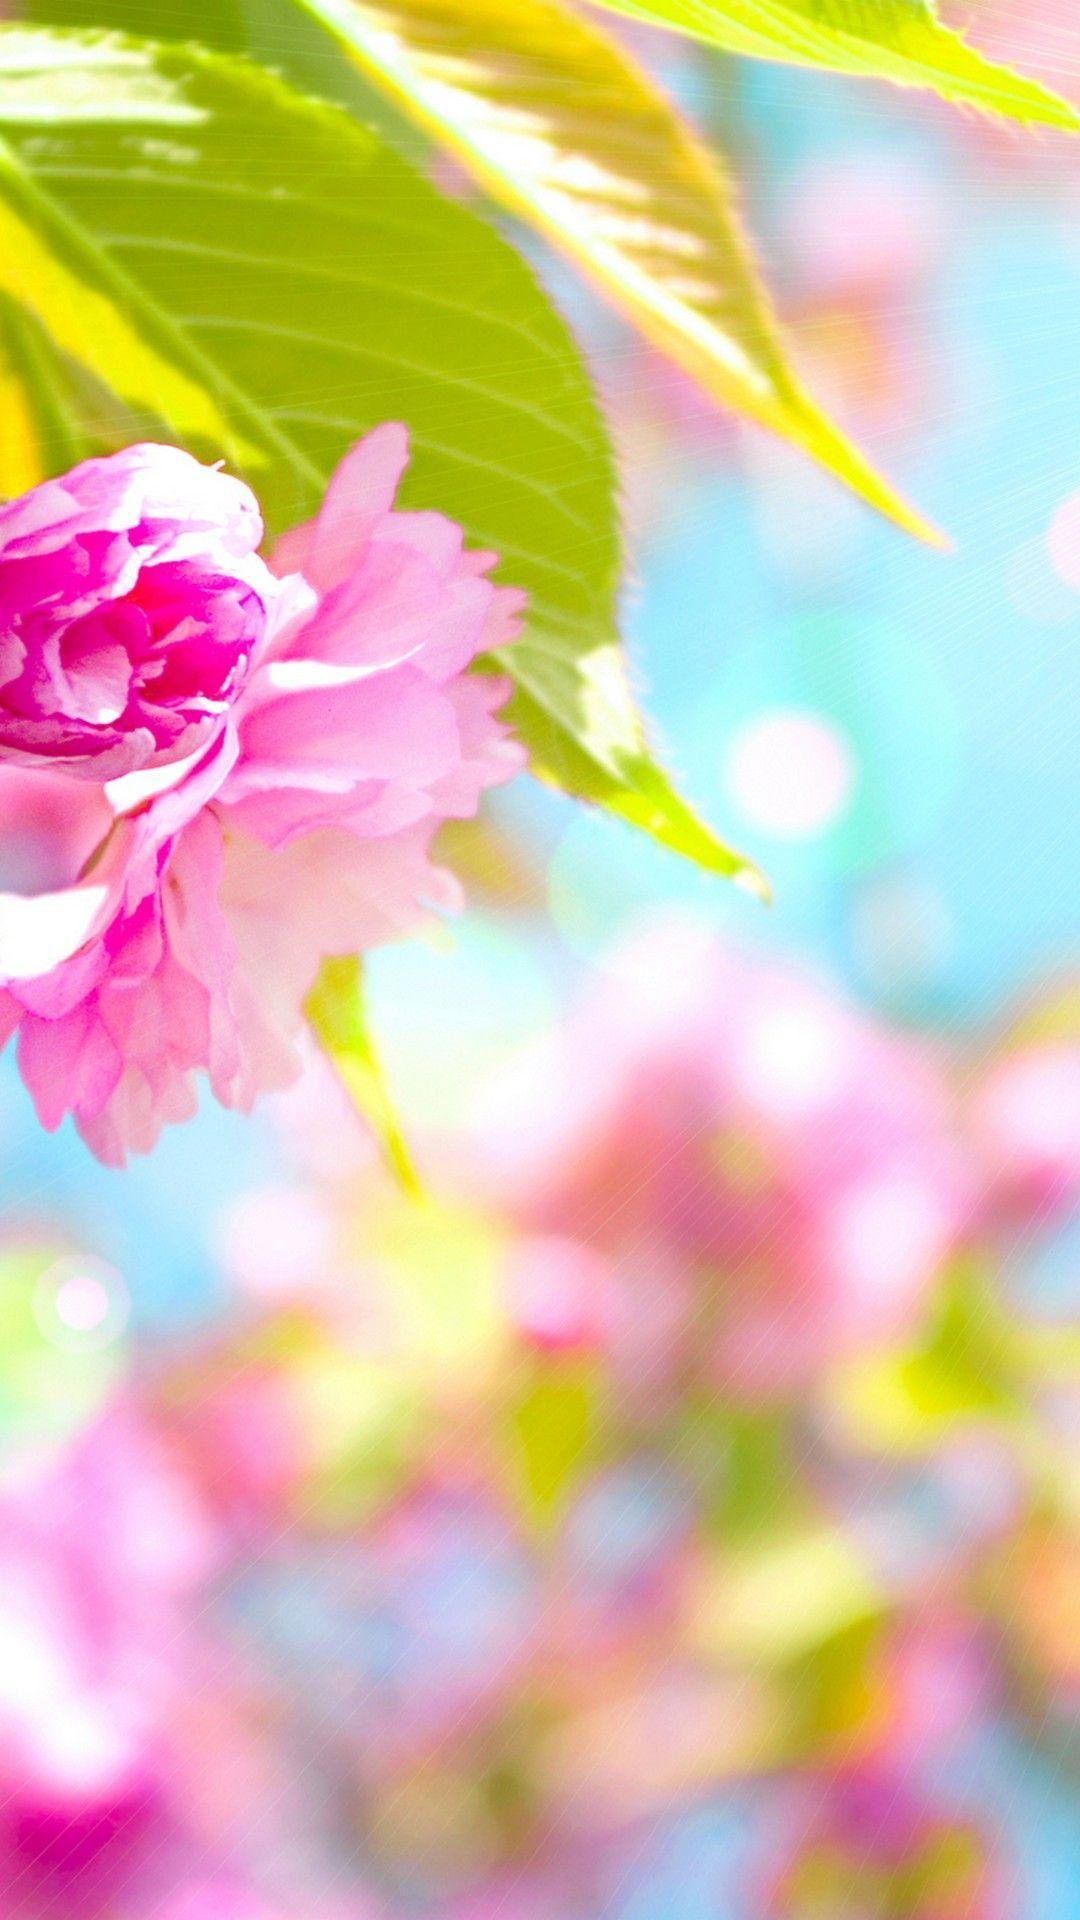 Cute Spring Iphone Wallpapers Top Free Cute Spring Iphone